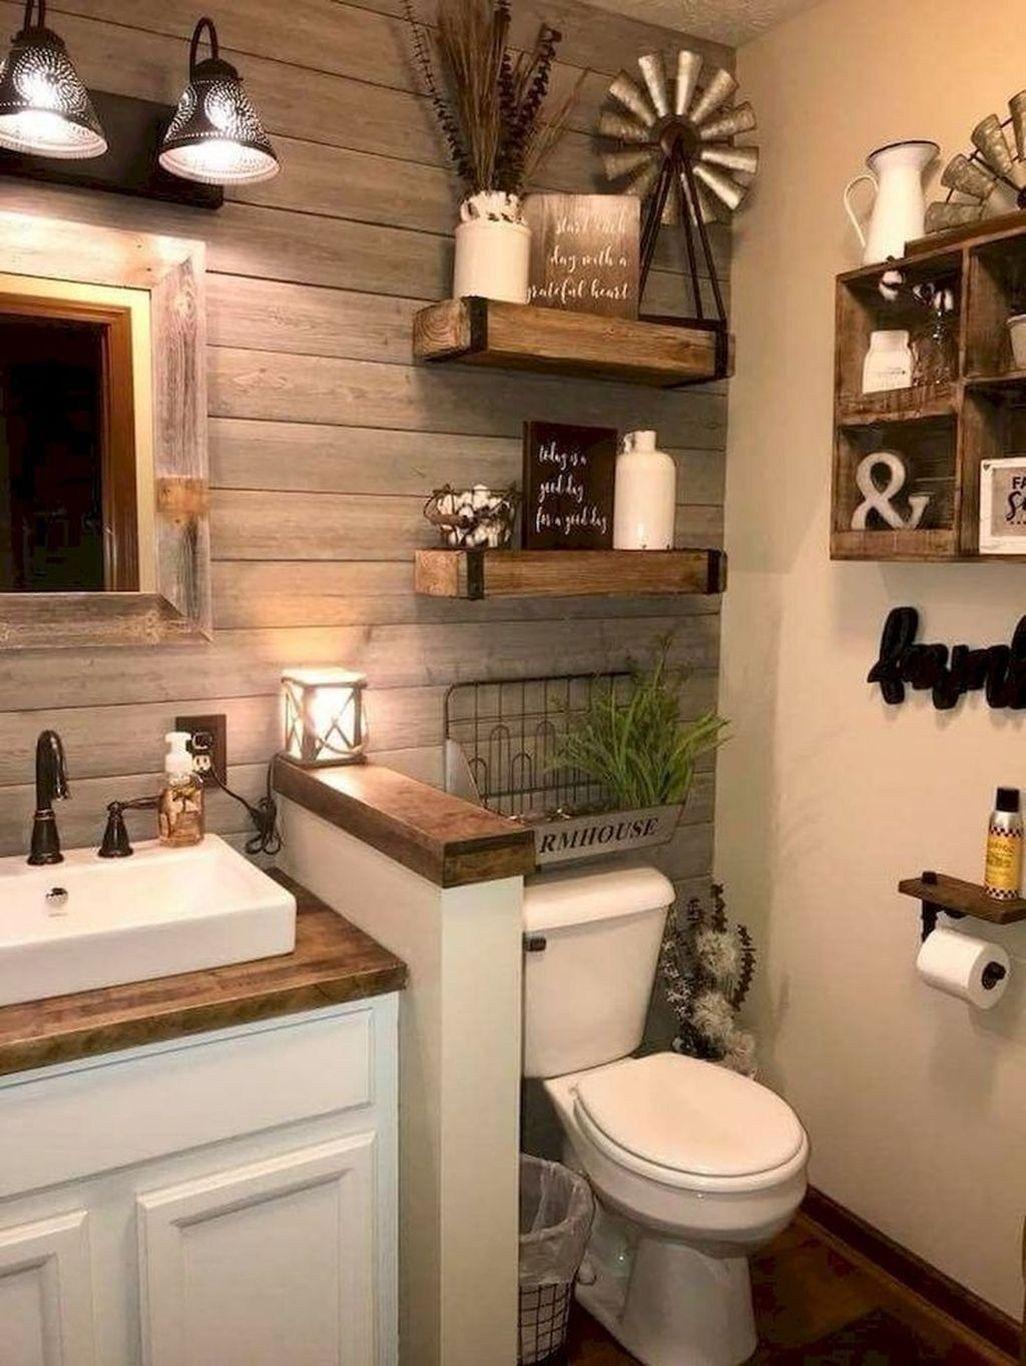 Unique Rustic Home Diy Decor Ideas 01 Small Bathroom Remodel